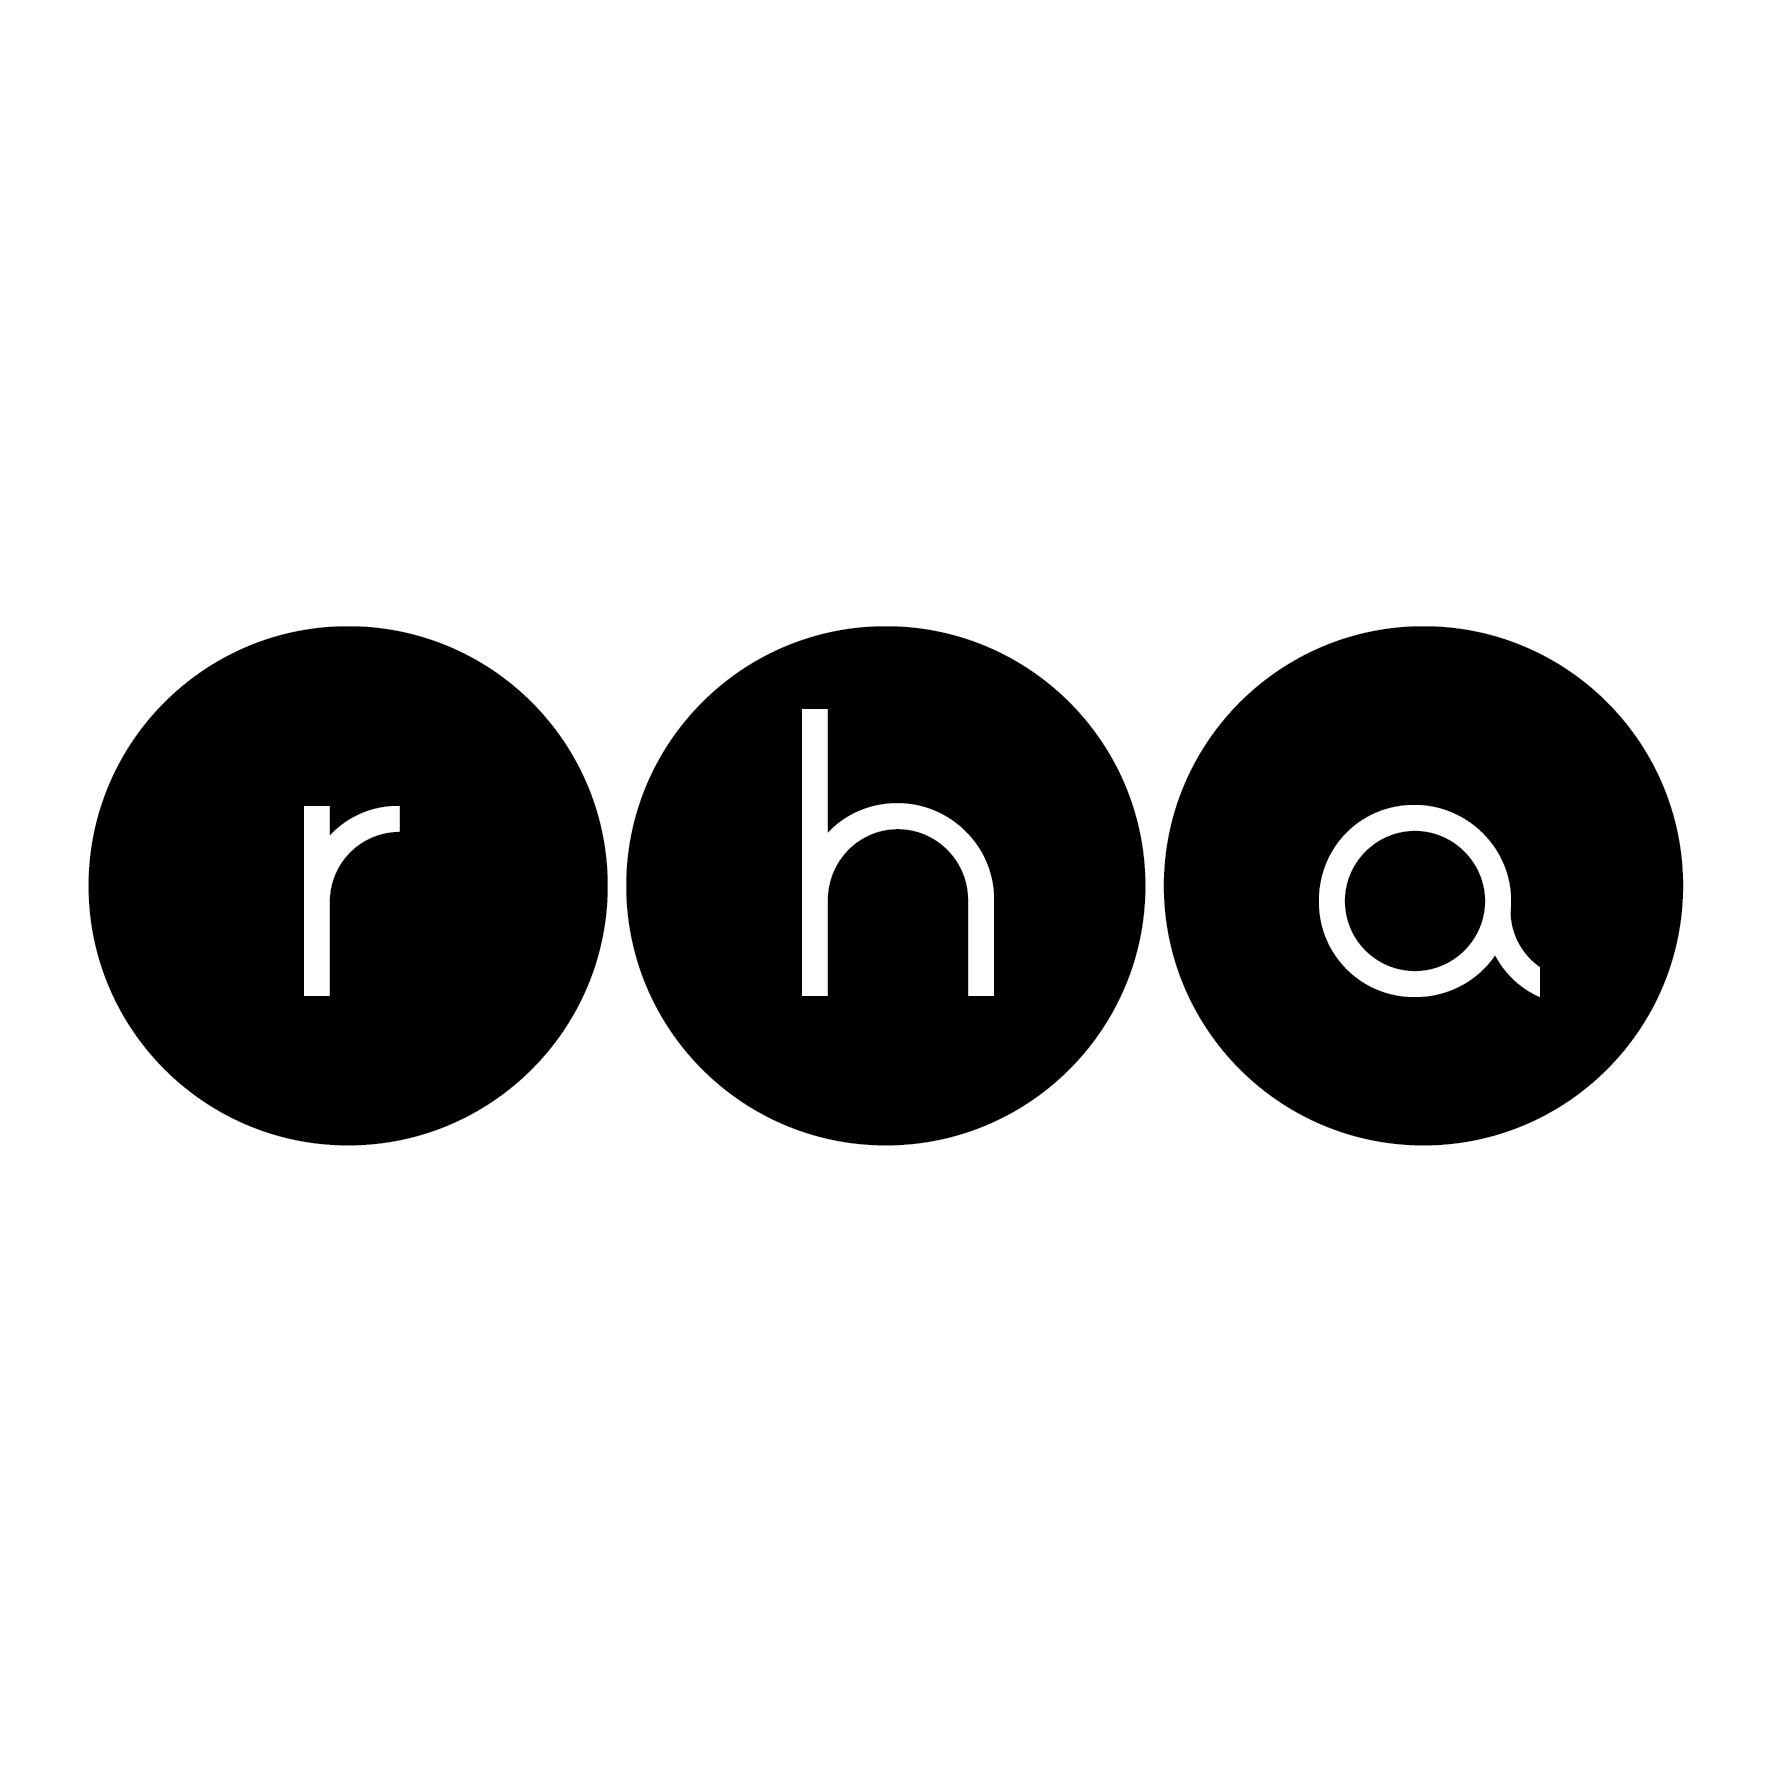 Part-II/Part-III Qualified Architect At Robert Hirschfield